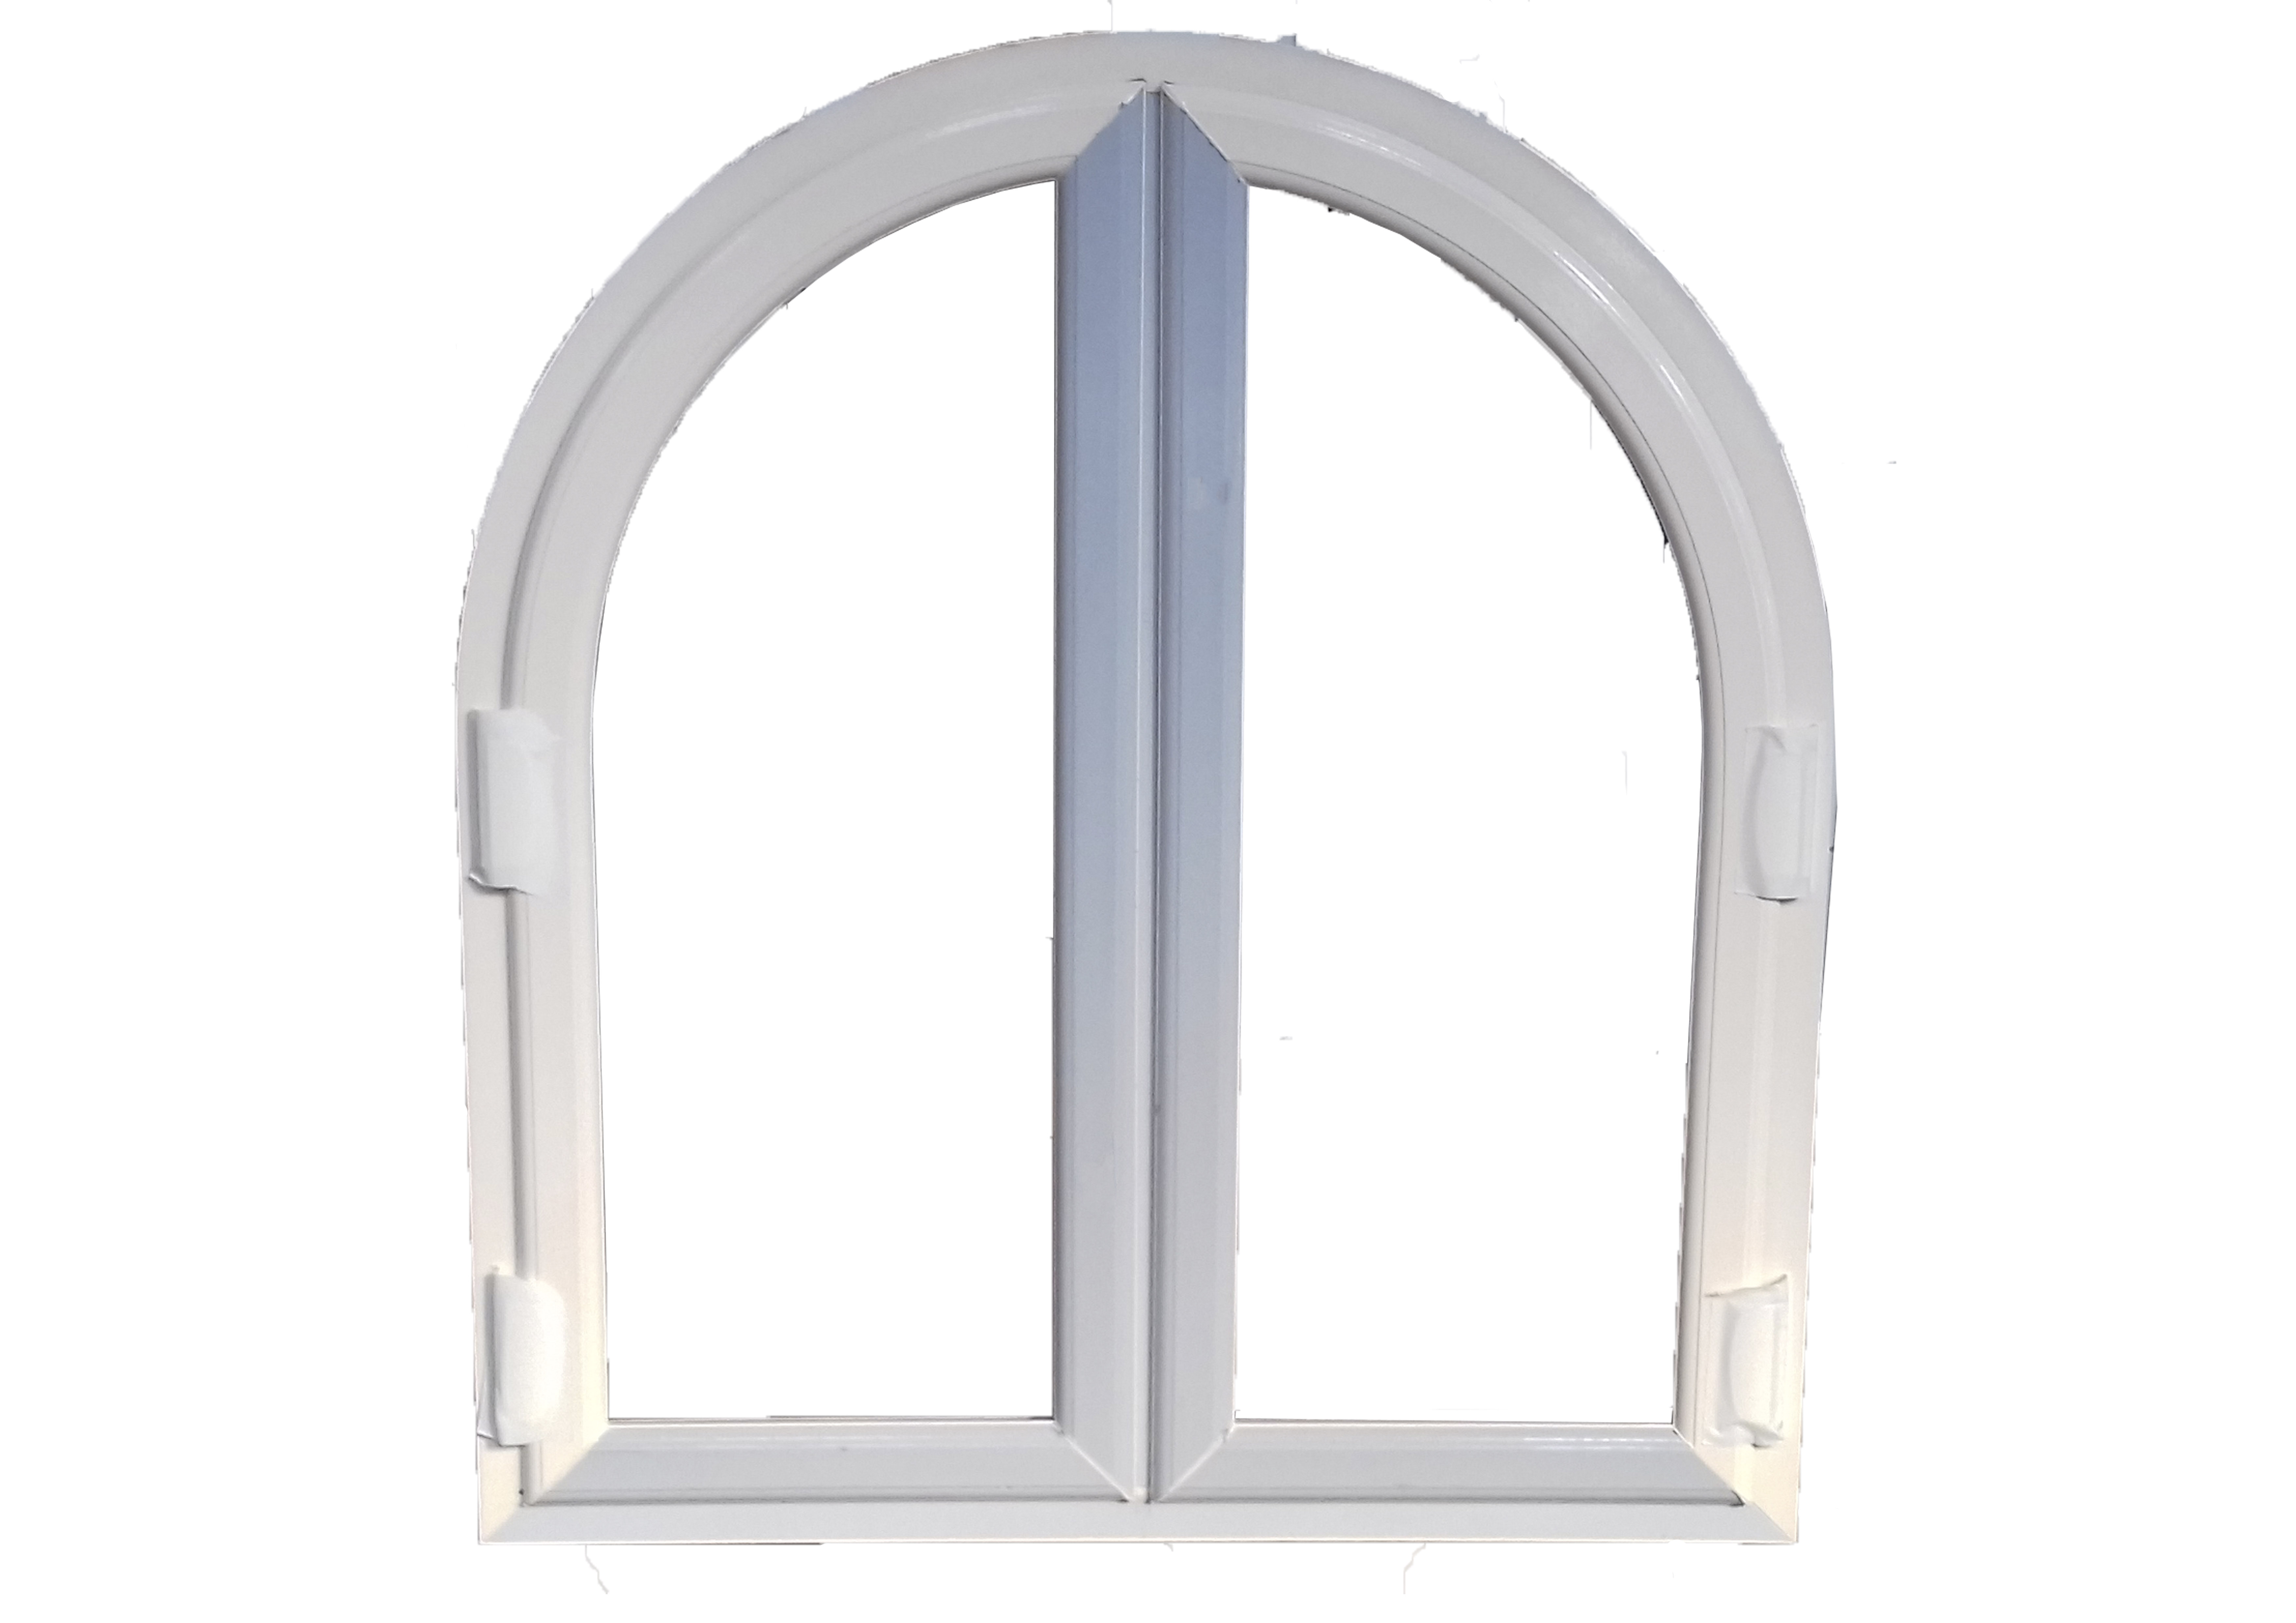 Unique Shaped Frames Composite Doors Arched Frames And